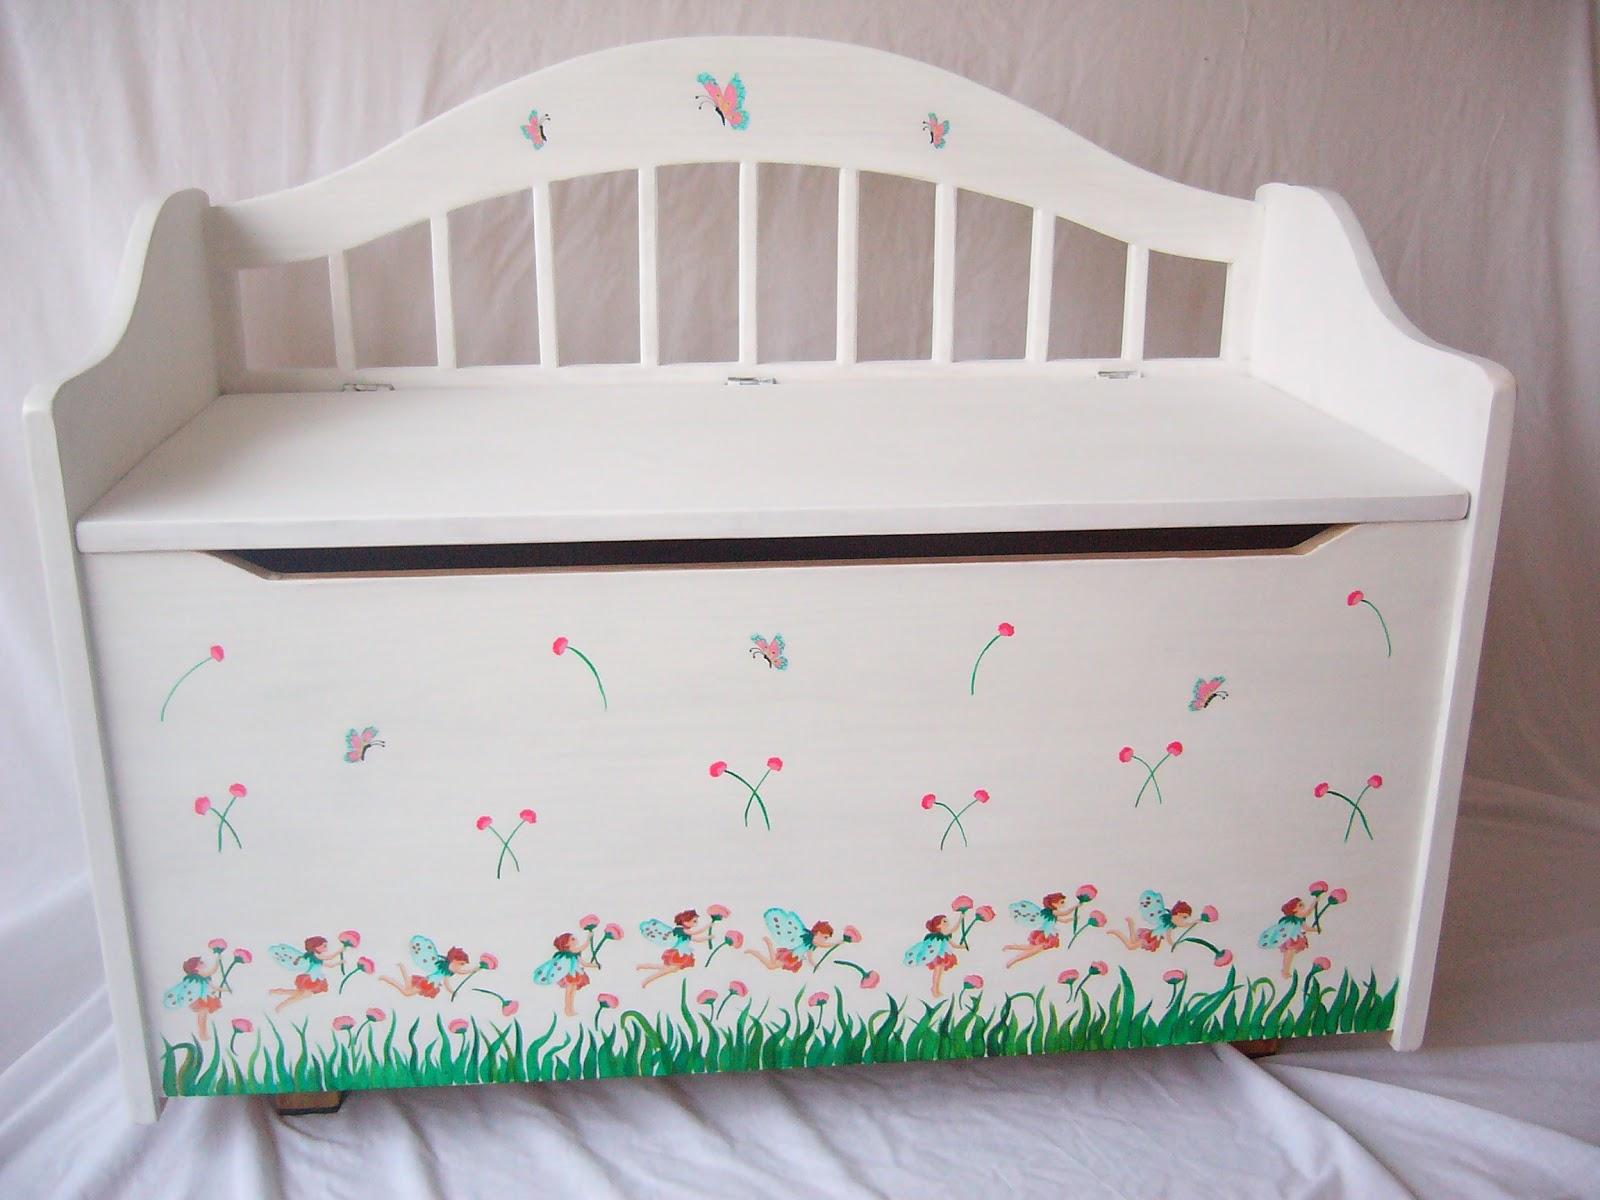 Muebles infantiles decoraci n para ni os juguetes tejidos manualidades cocina etc - Muebles para juguetes infantiles ...